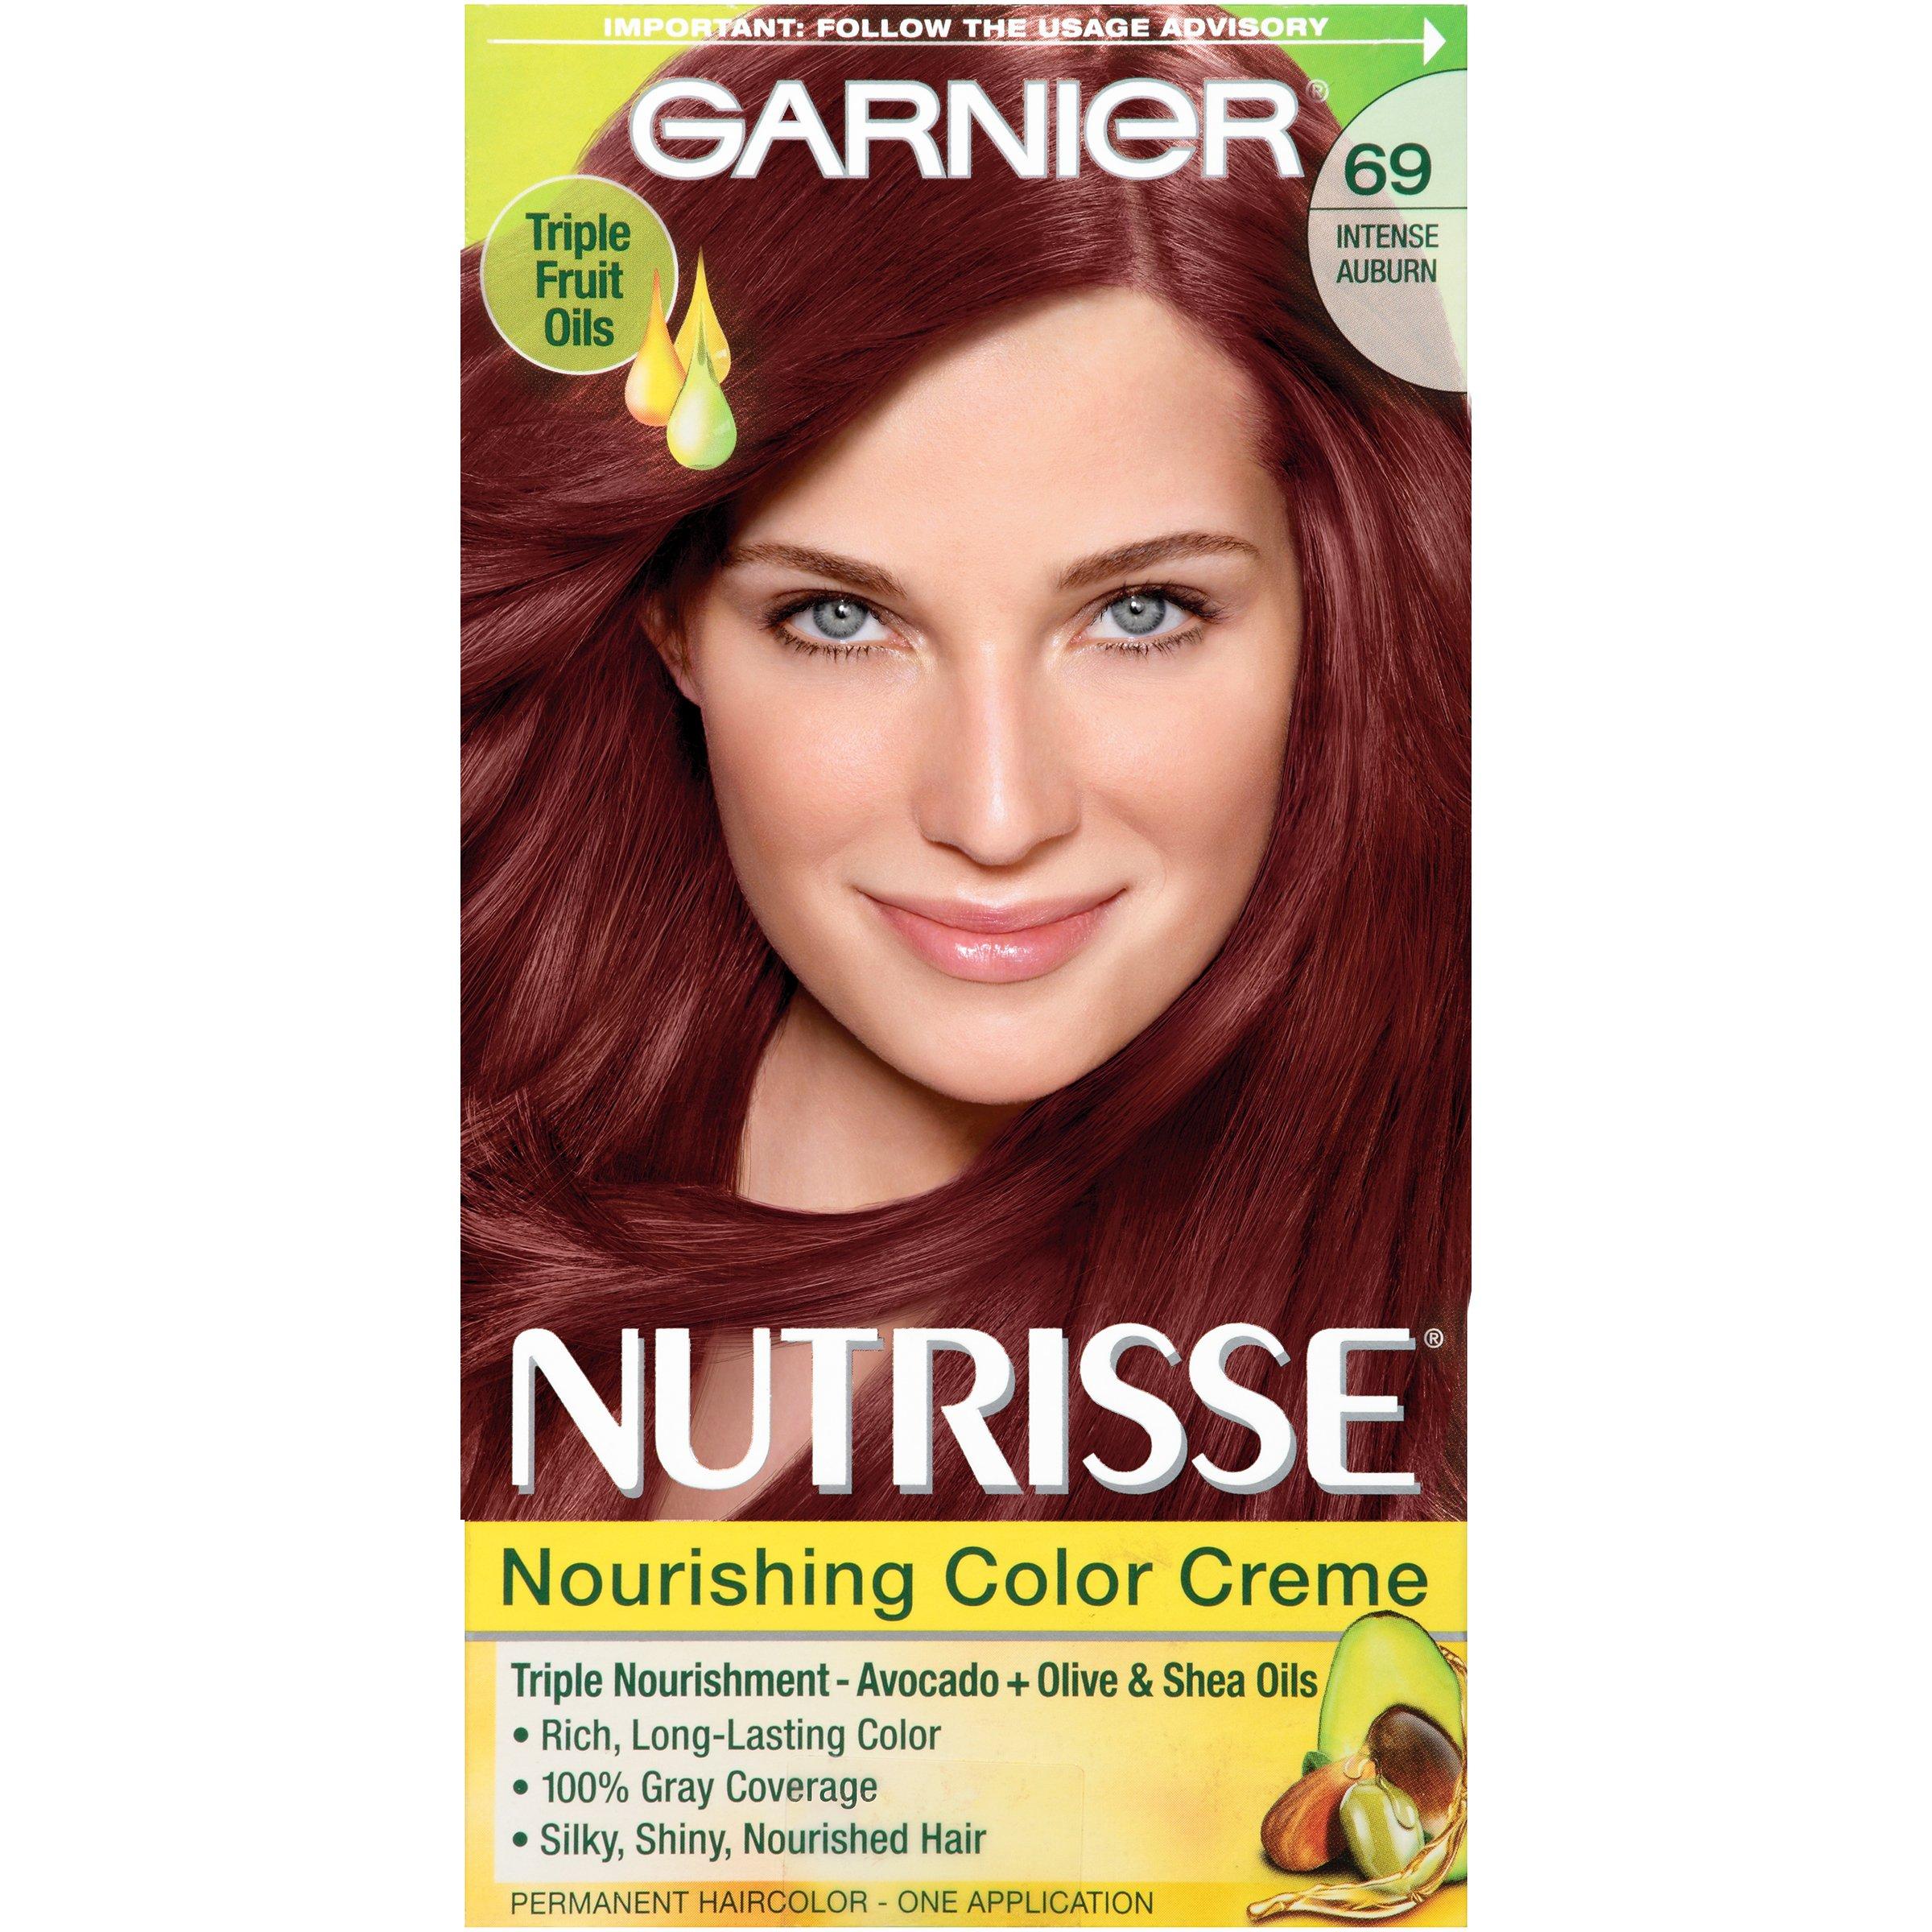 Cheap Garnier Nutrisse Coupons Find Garnier Nutrisse Coupons Deals